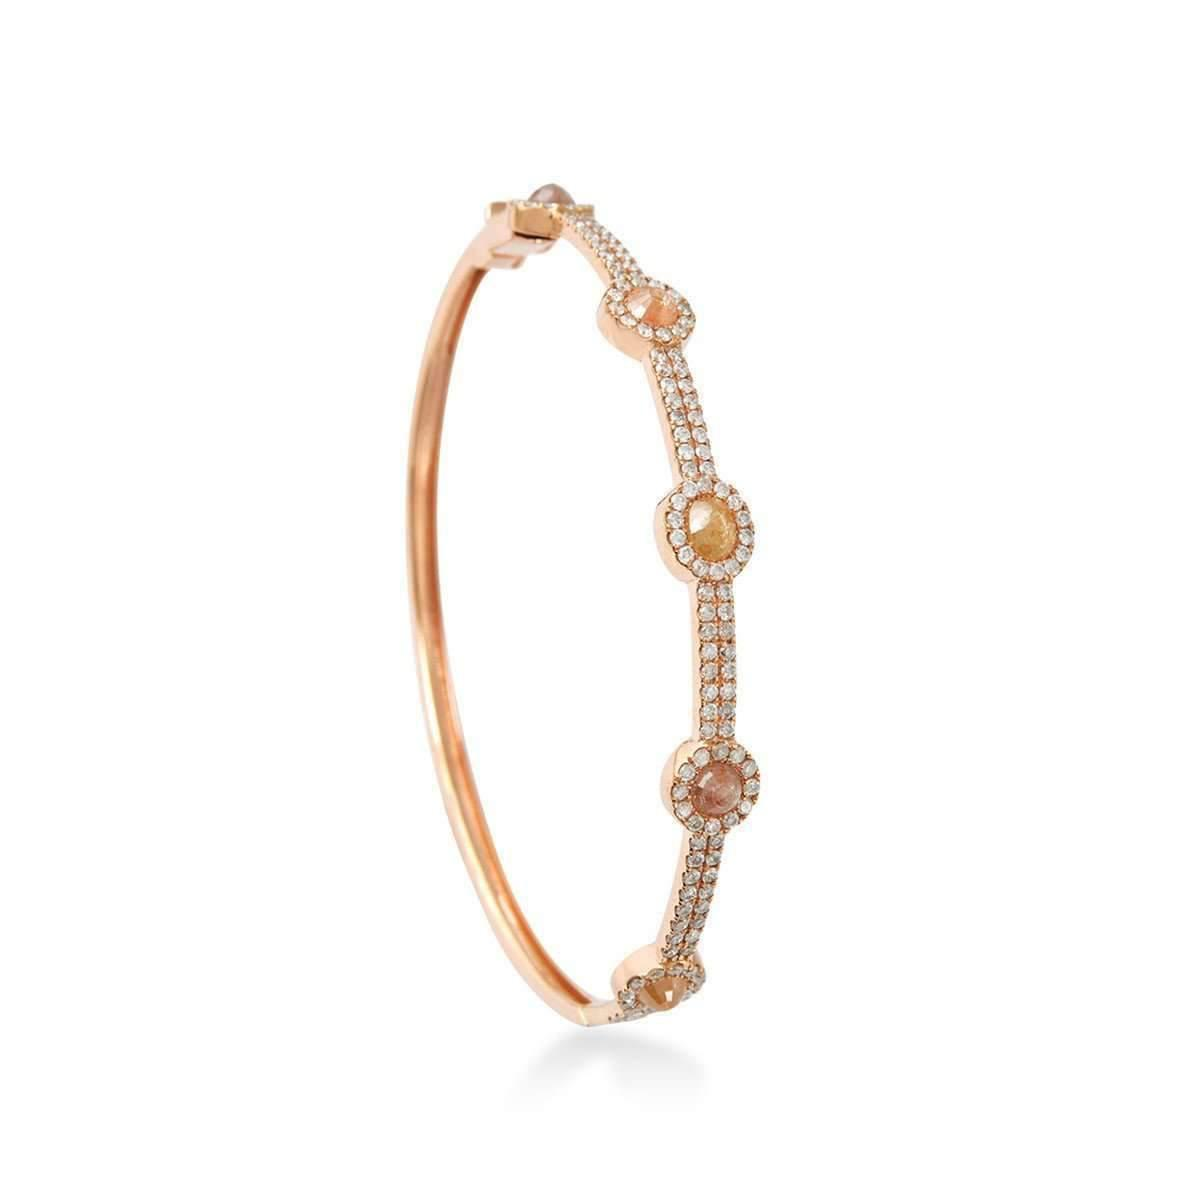 Socheec Gold and Diamond Sphere Bangle KkEvR2qo